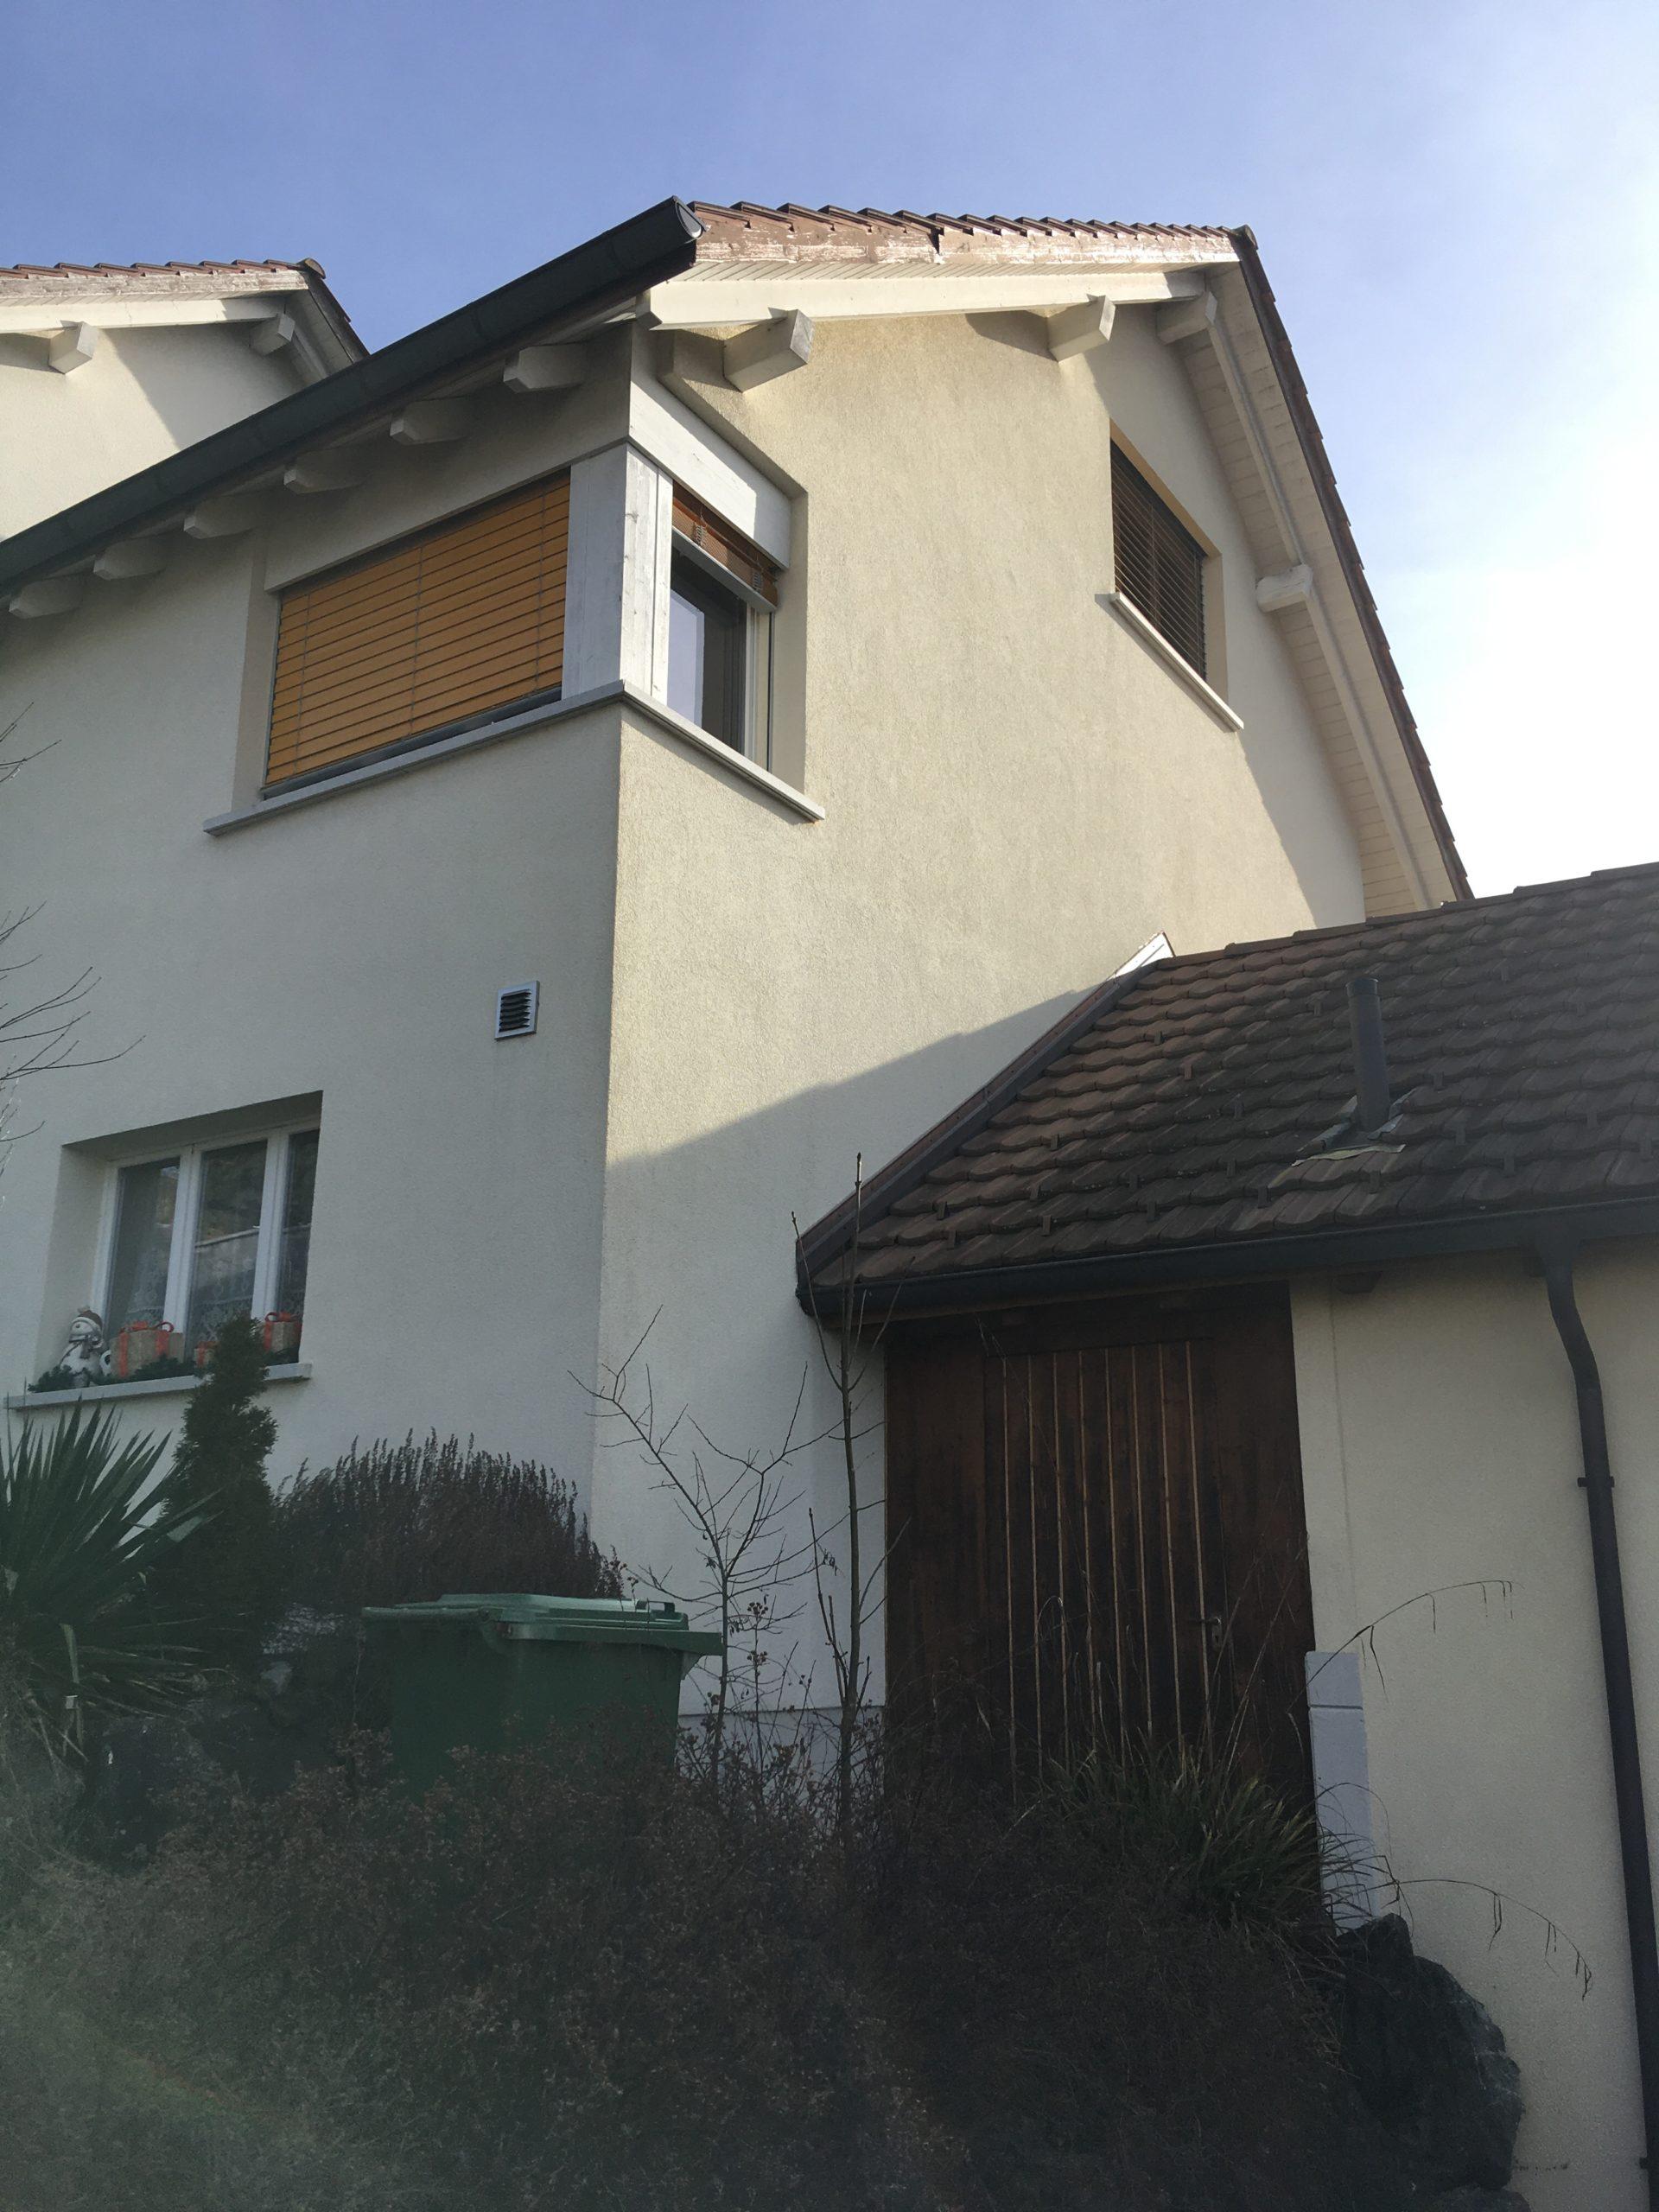 https://www.koster-gs.ch/wp-content/uploads/2020/07/Lütisburg-Fassade-nachher-Nord-West-scaled.jpg